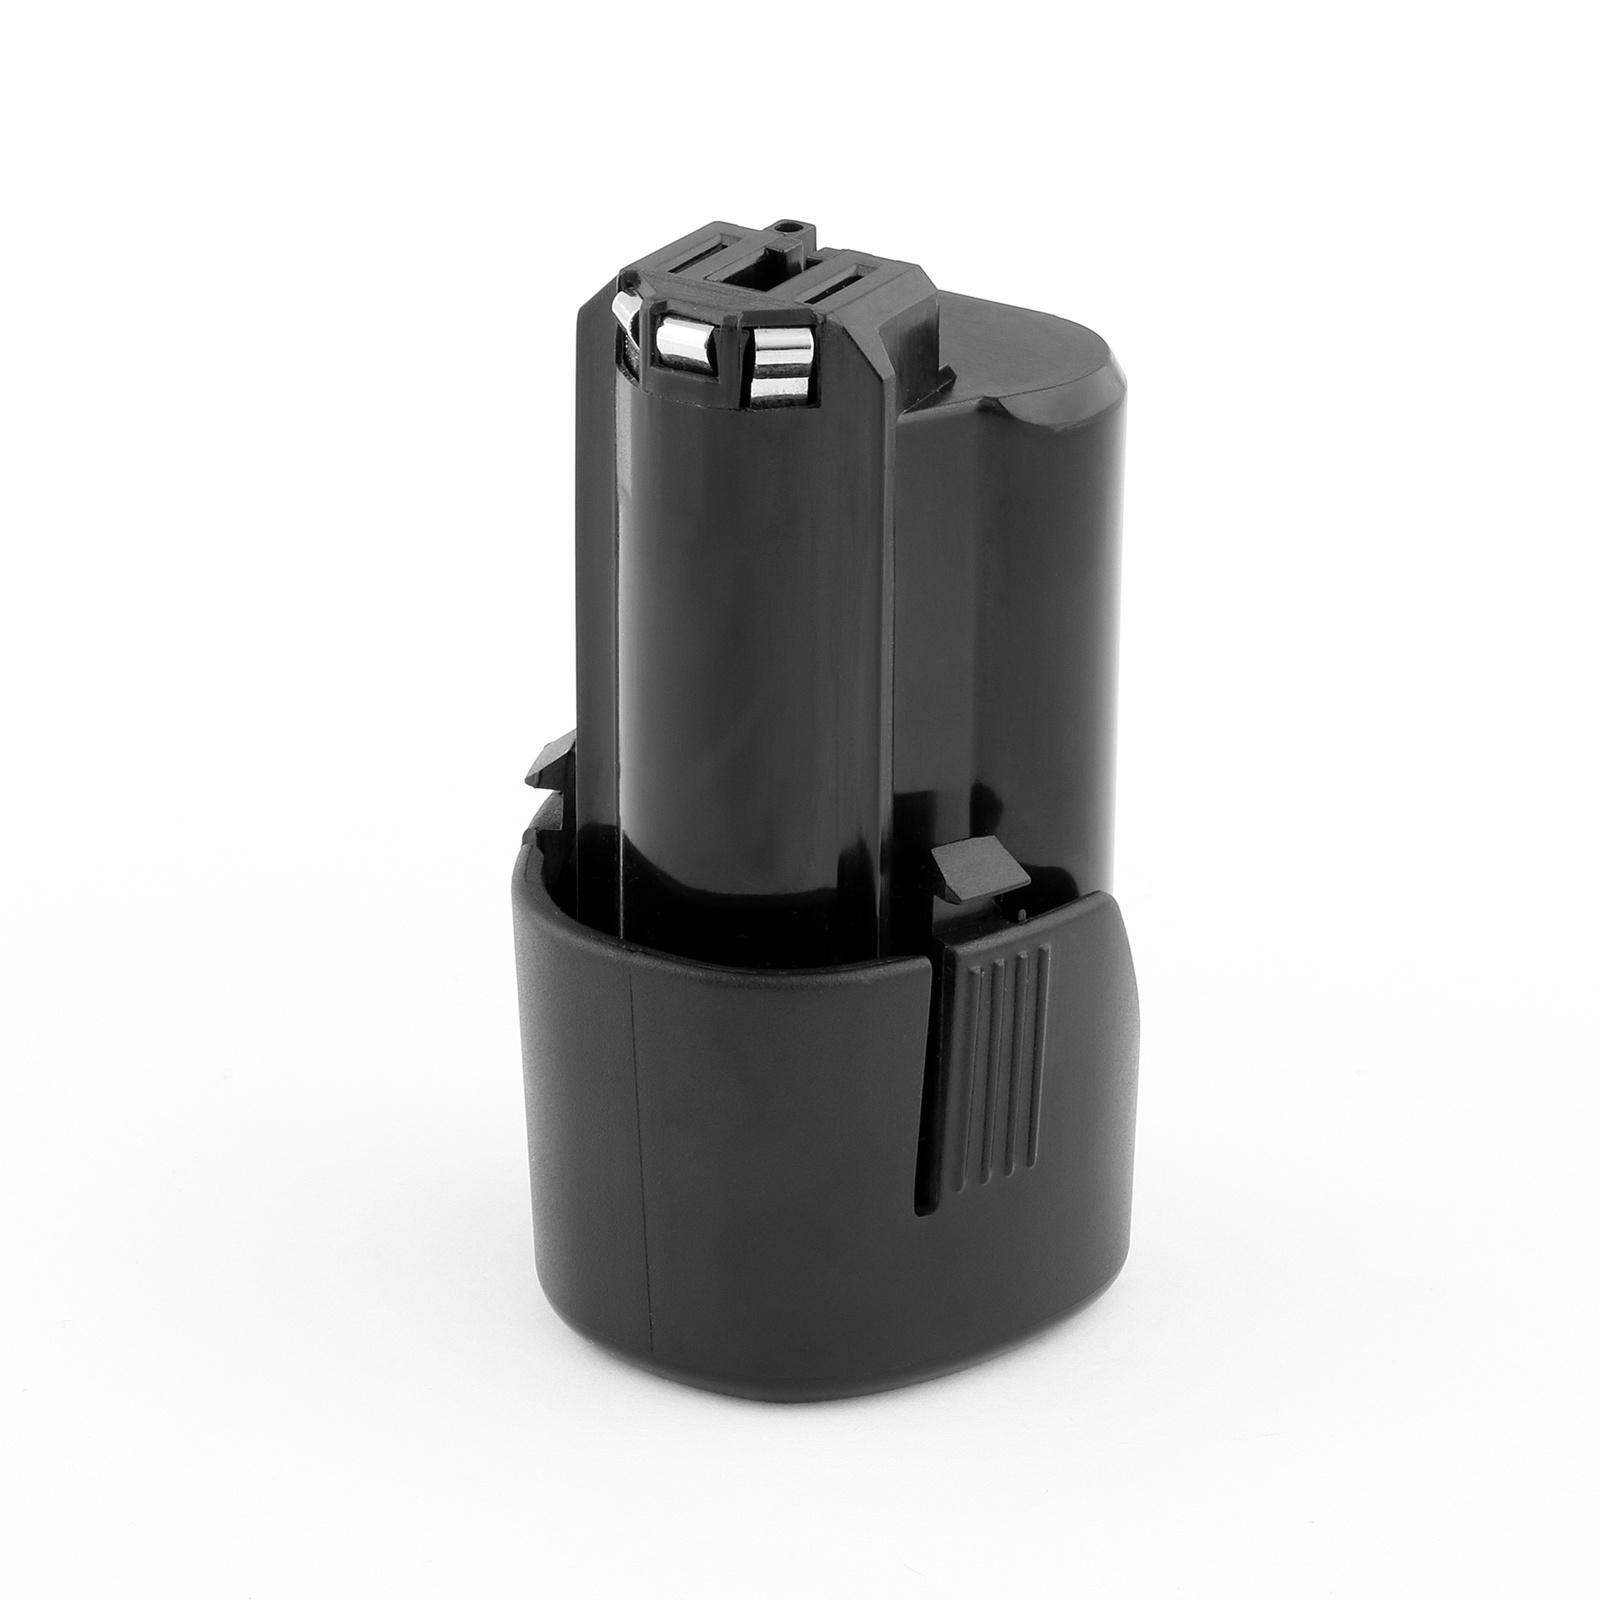 цена на Аккумулятор для инструмента TopON TOP-PTGD-BOS-10.8-2.0